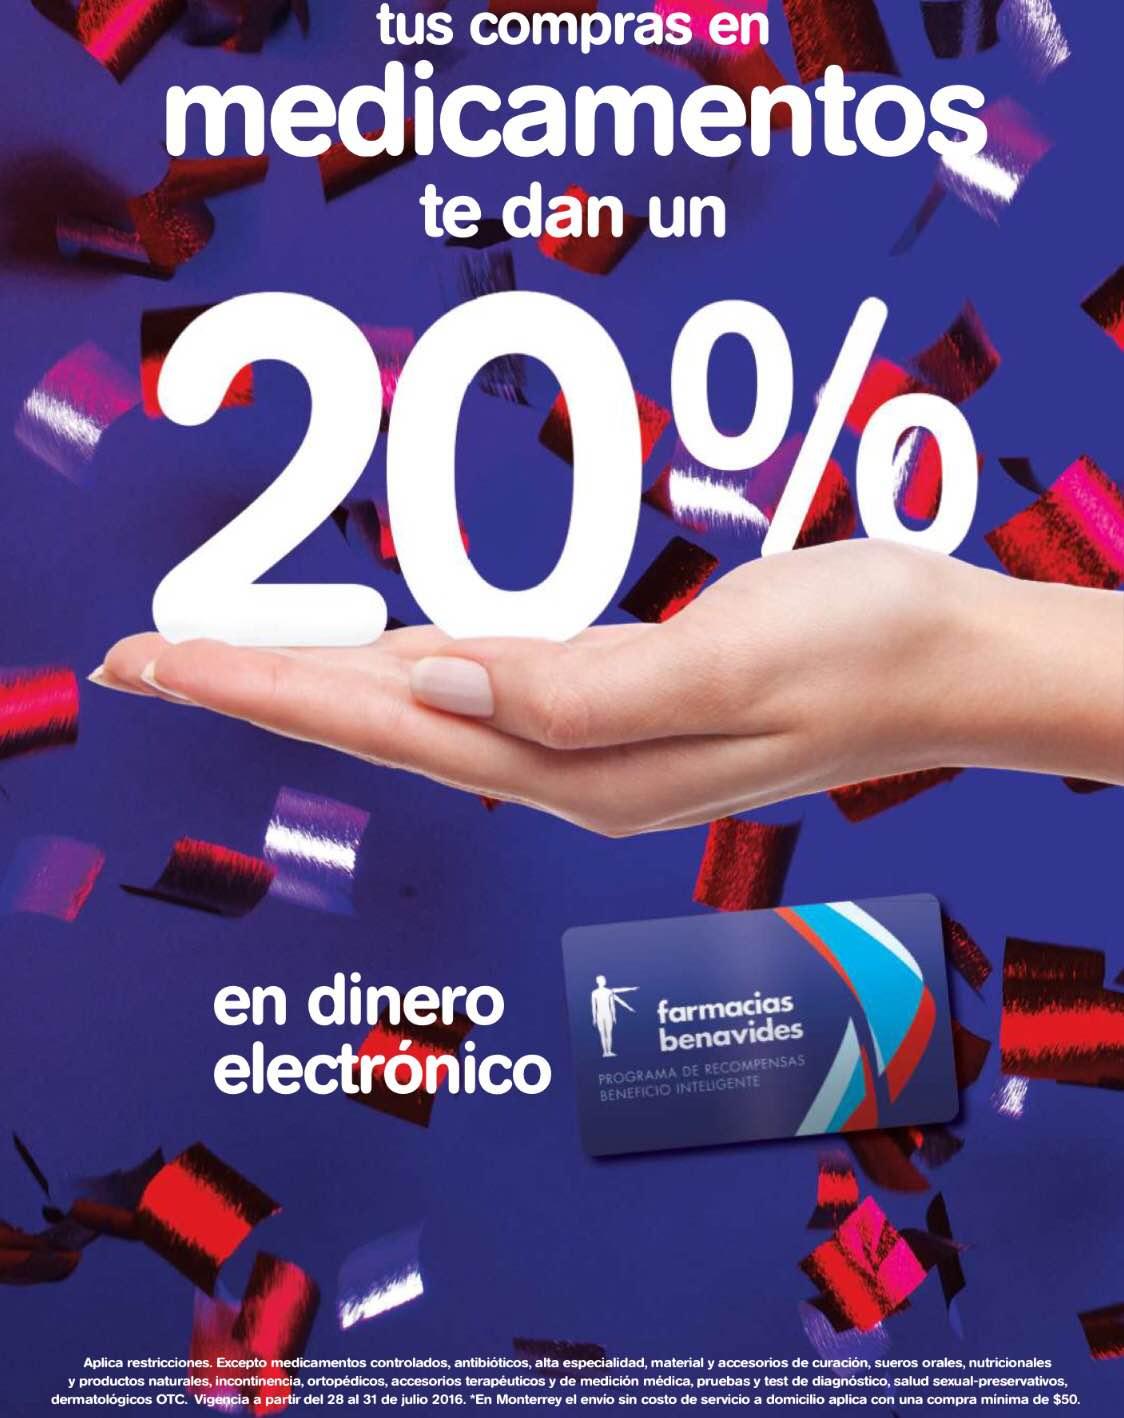 Farmacias Benavides: 20% de bonificación en medicamentos